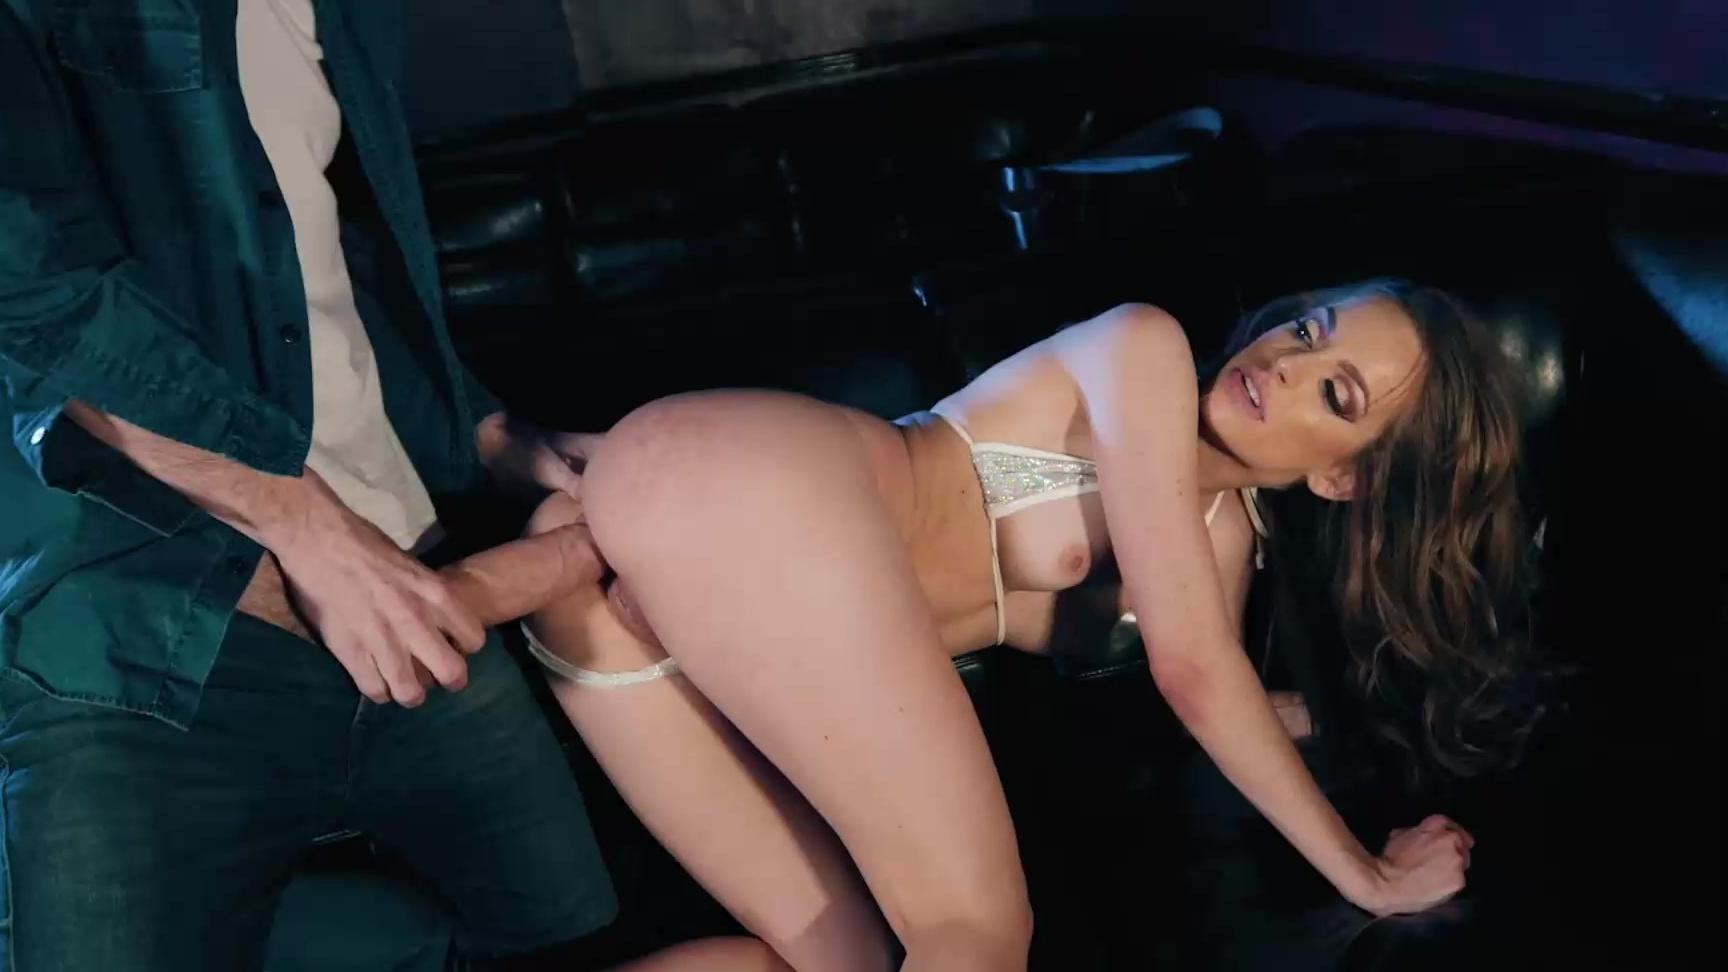 Kimmy granger at strip club